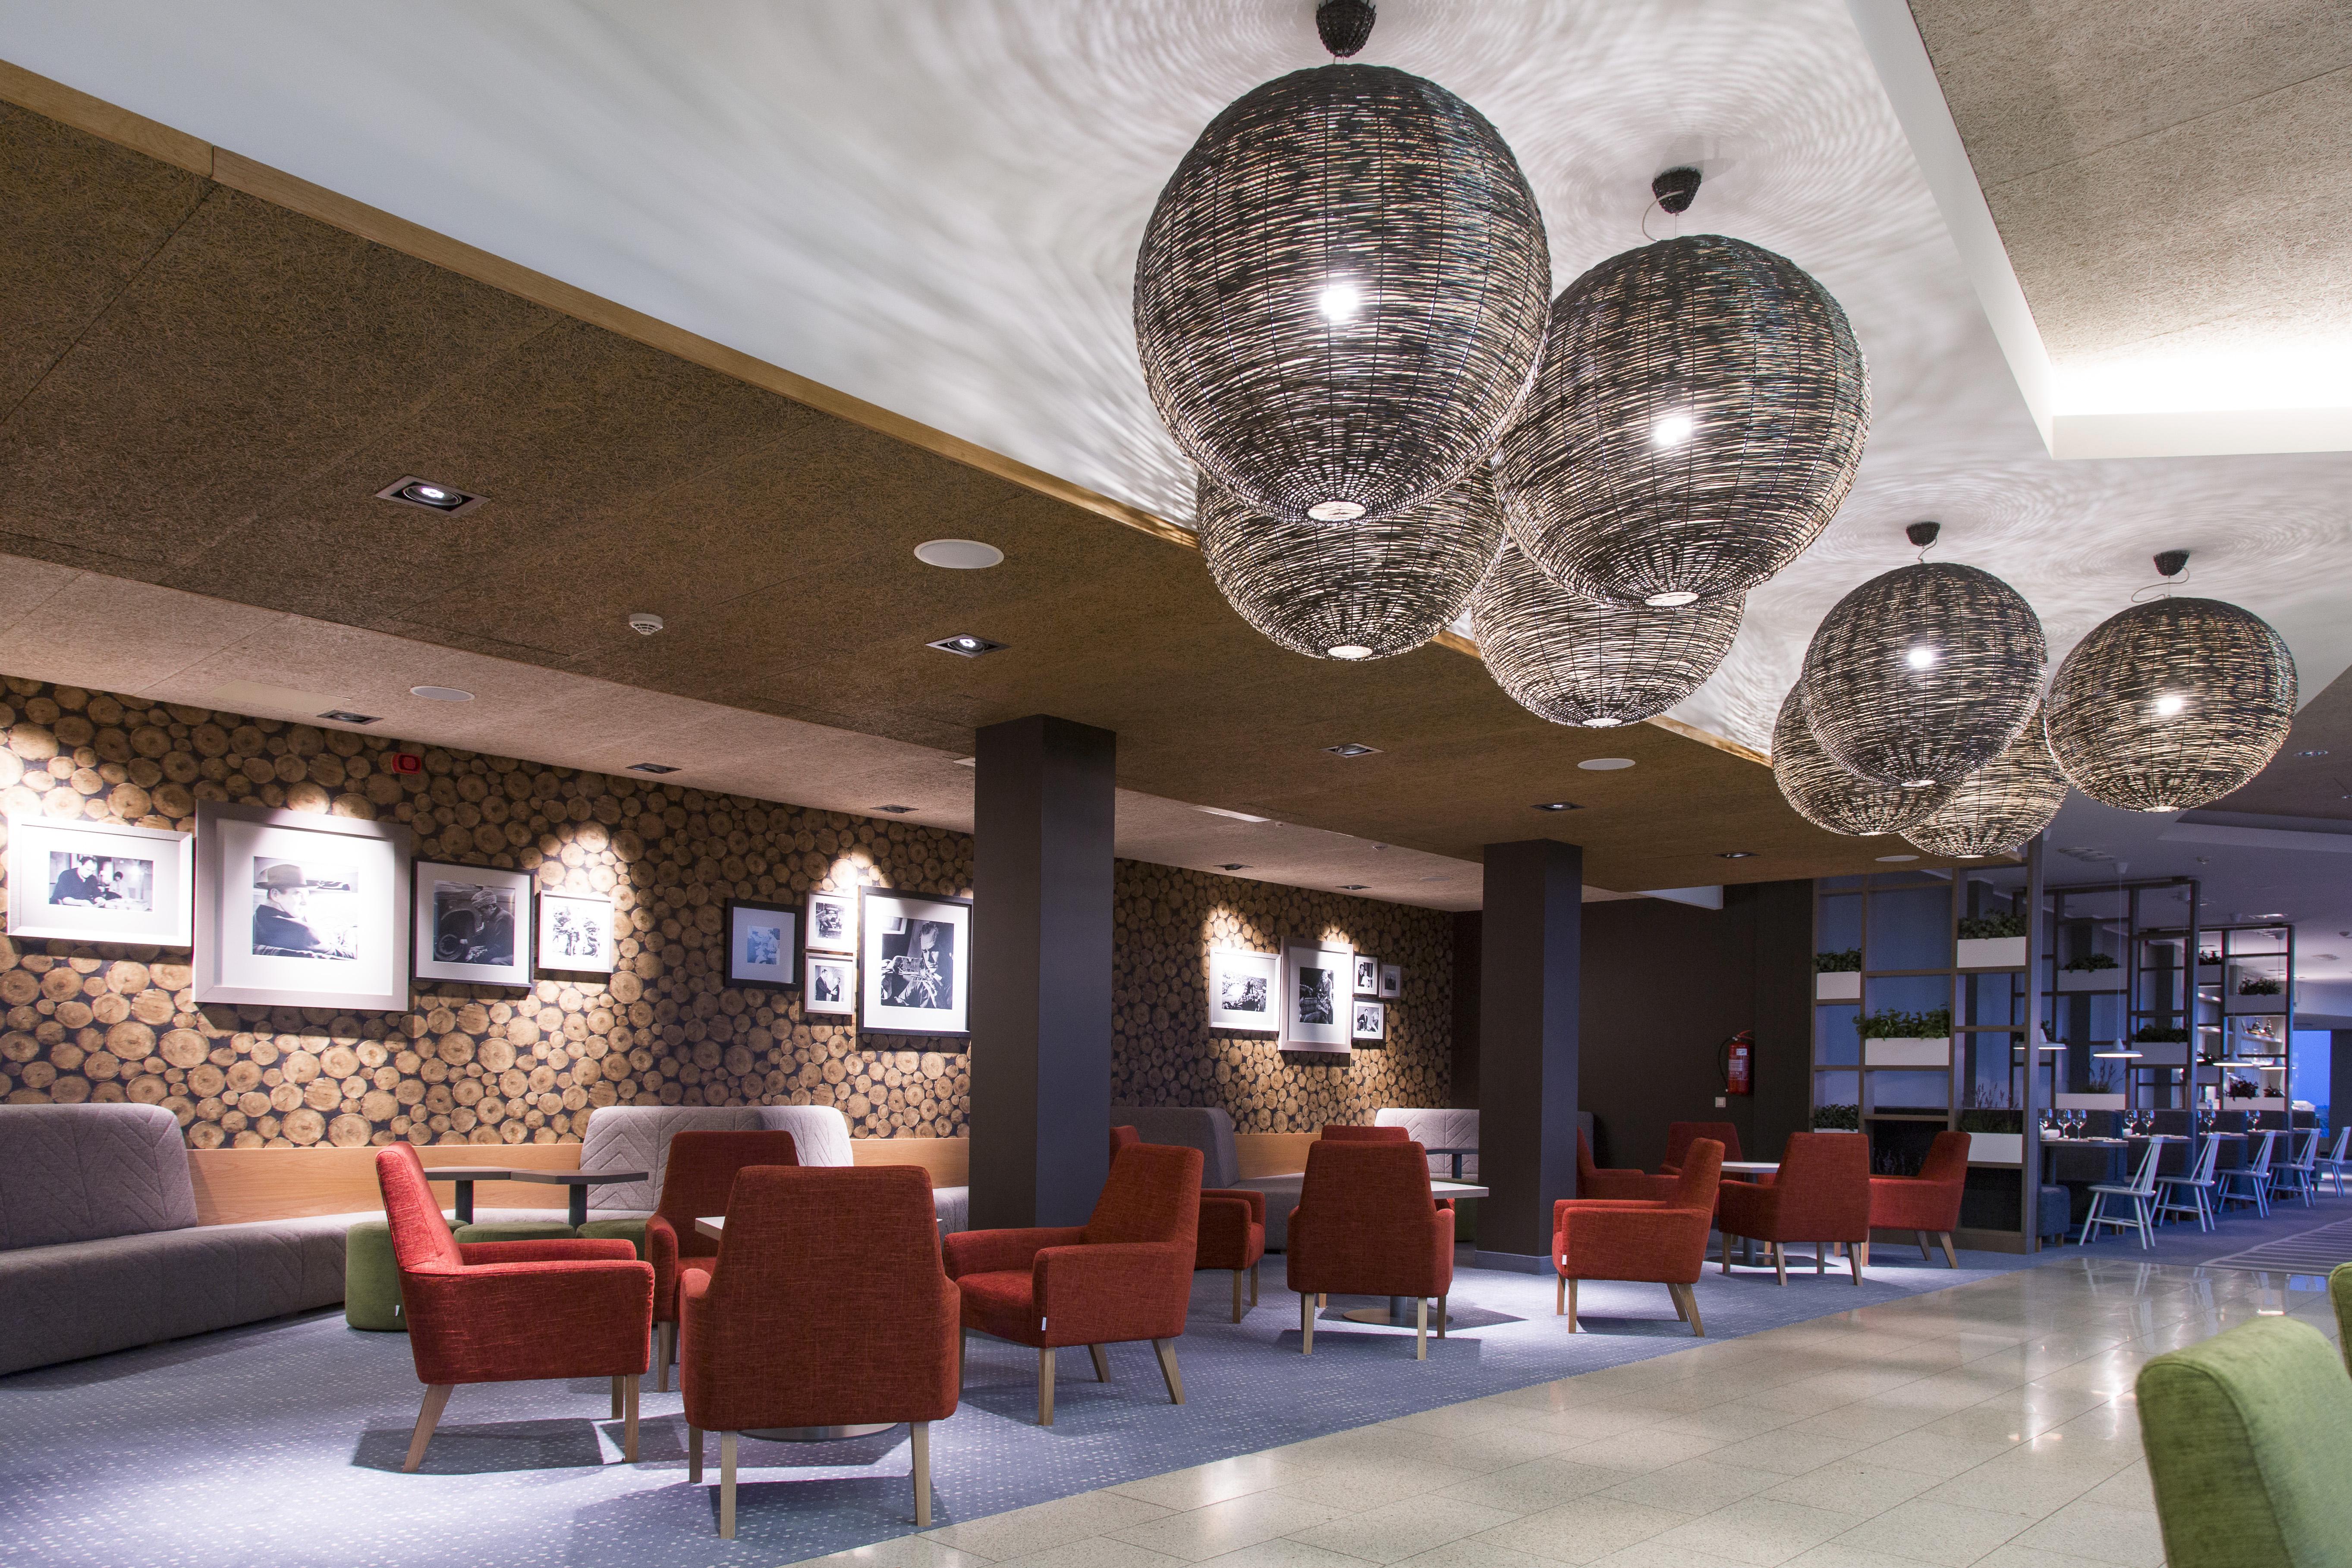 296483e179d Restoran ja lounge - Georg Ots Spa hotell | Saaremaa